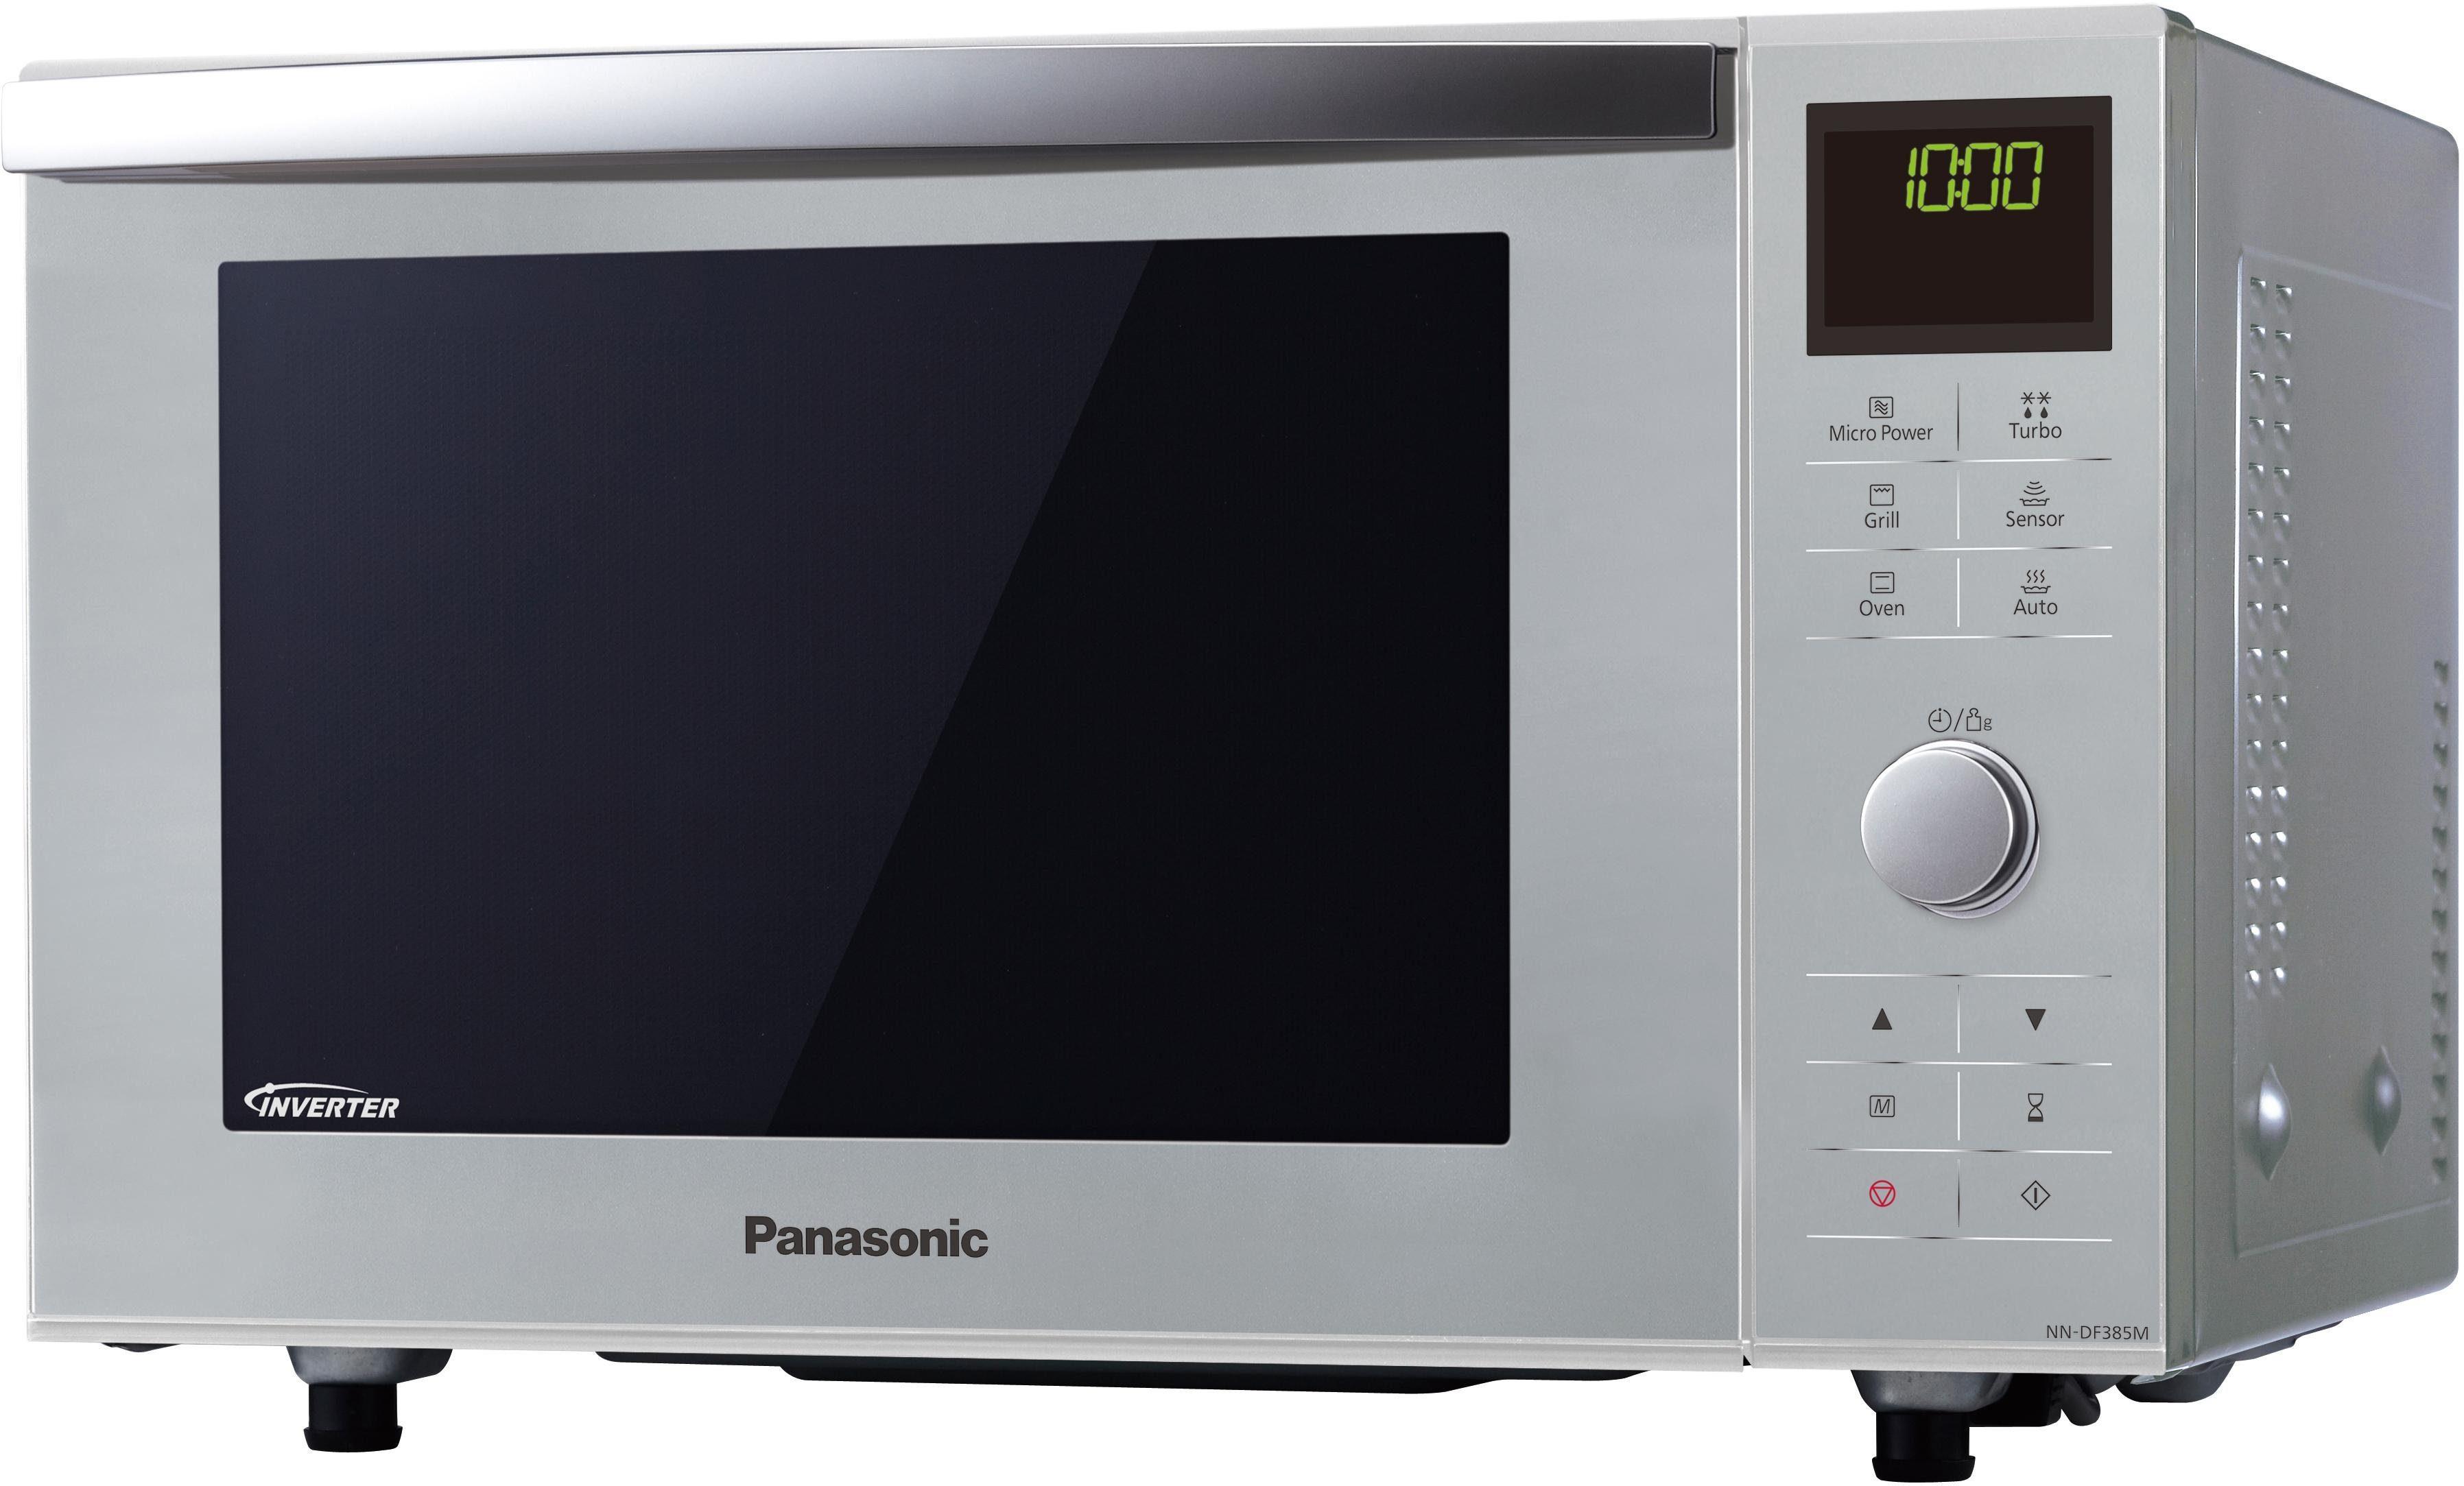 Panasonic Inverter Mikrowelle NN-DF385MEPG, mit Grill, 23 Liter Garraum, 1000 Watt